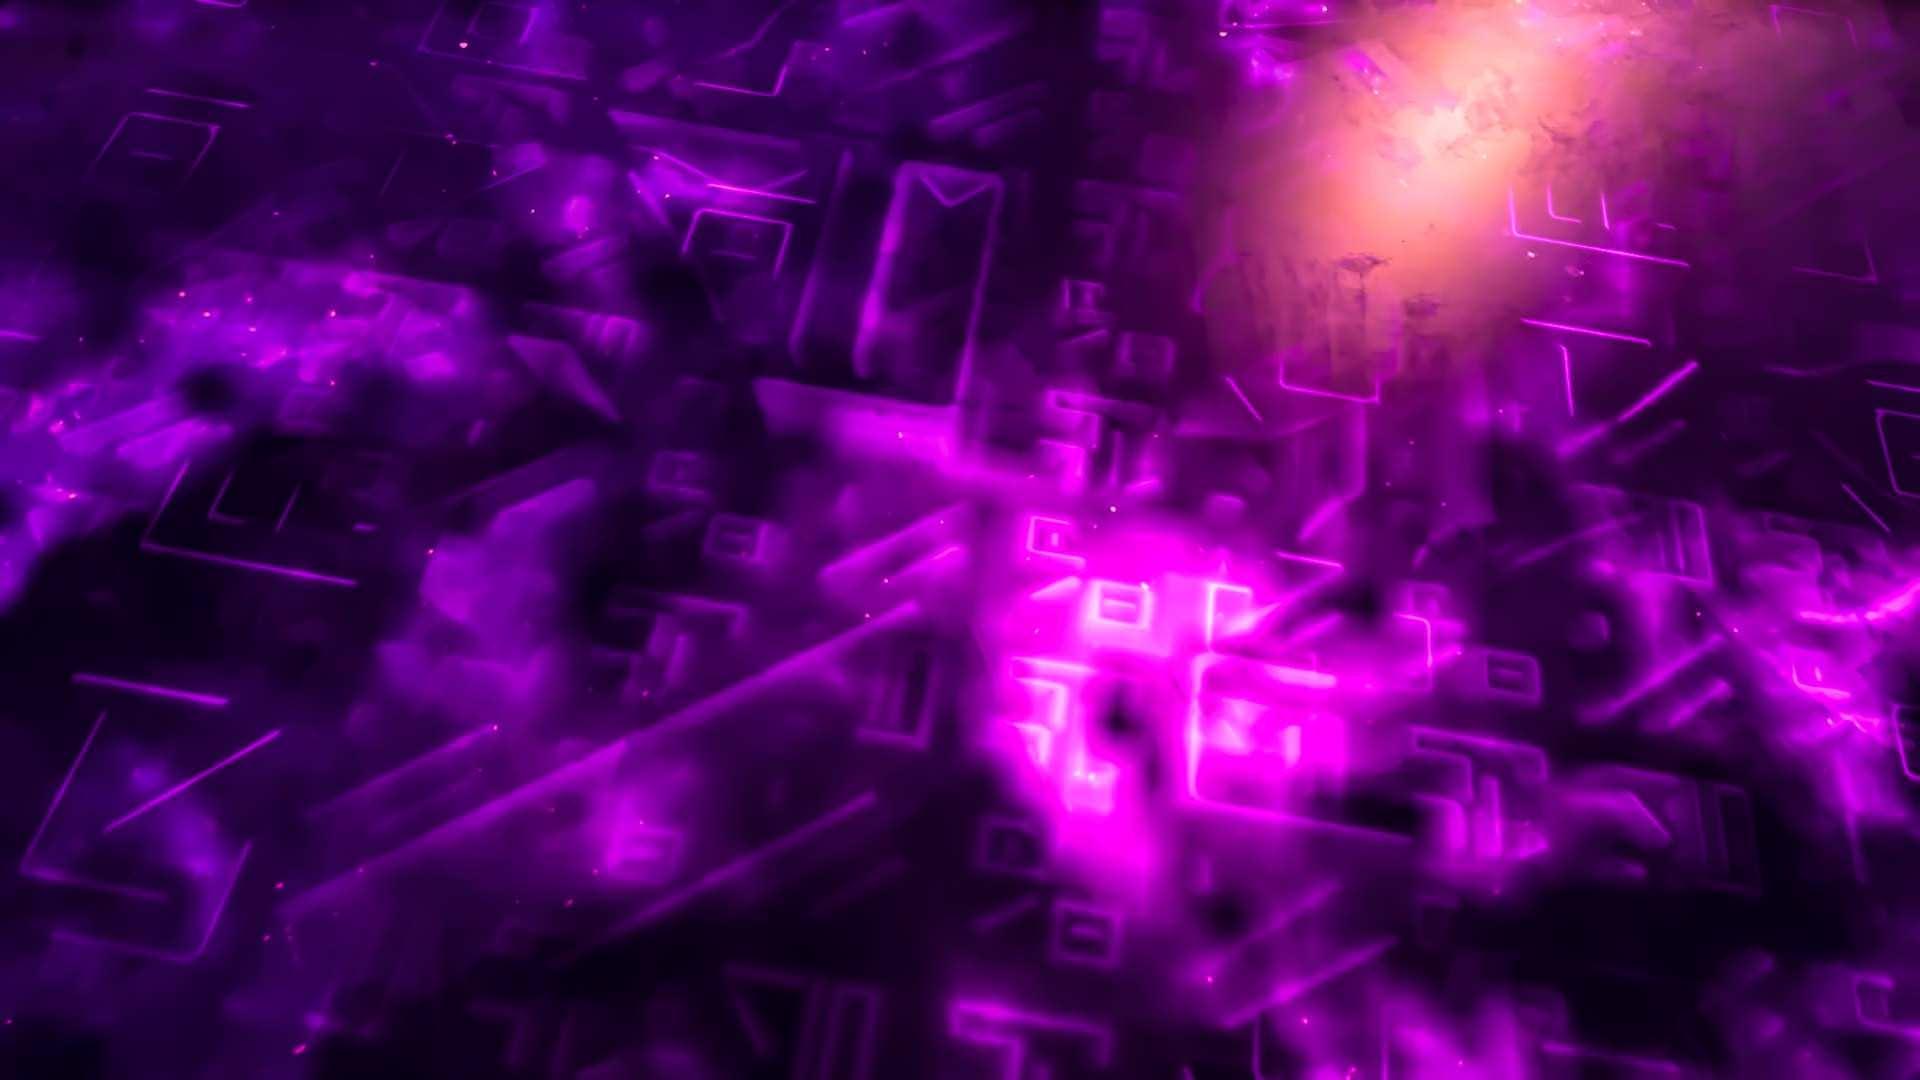 Fortnite Cube Wallpapers Wallpaper Cave